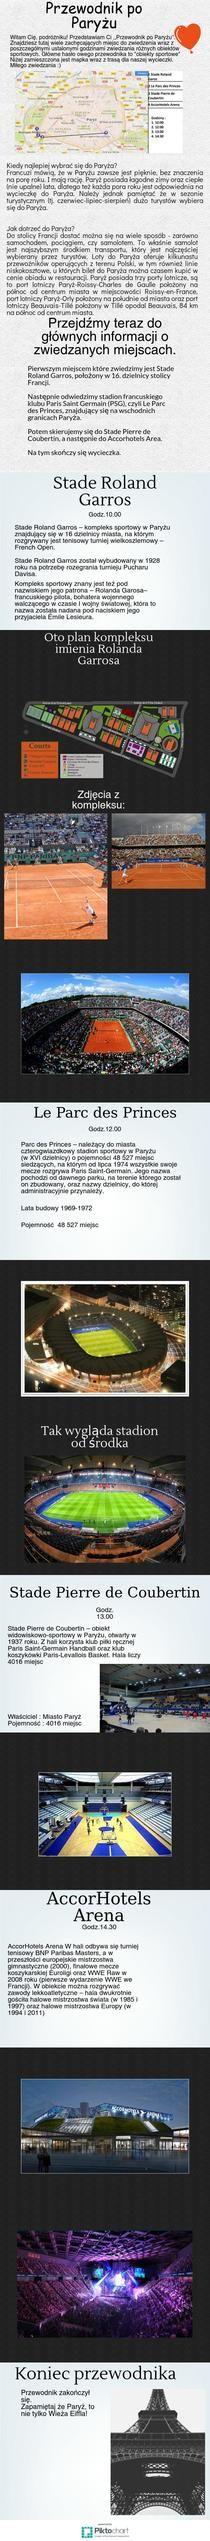 projekt k kozlowski   Piktochart Infographic Editor